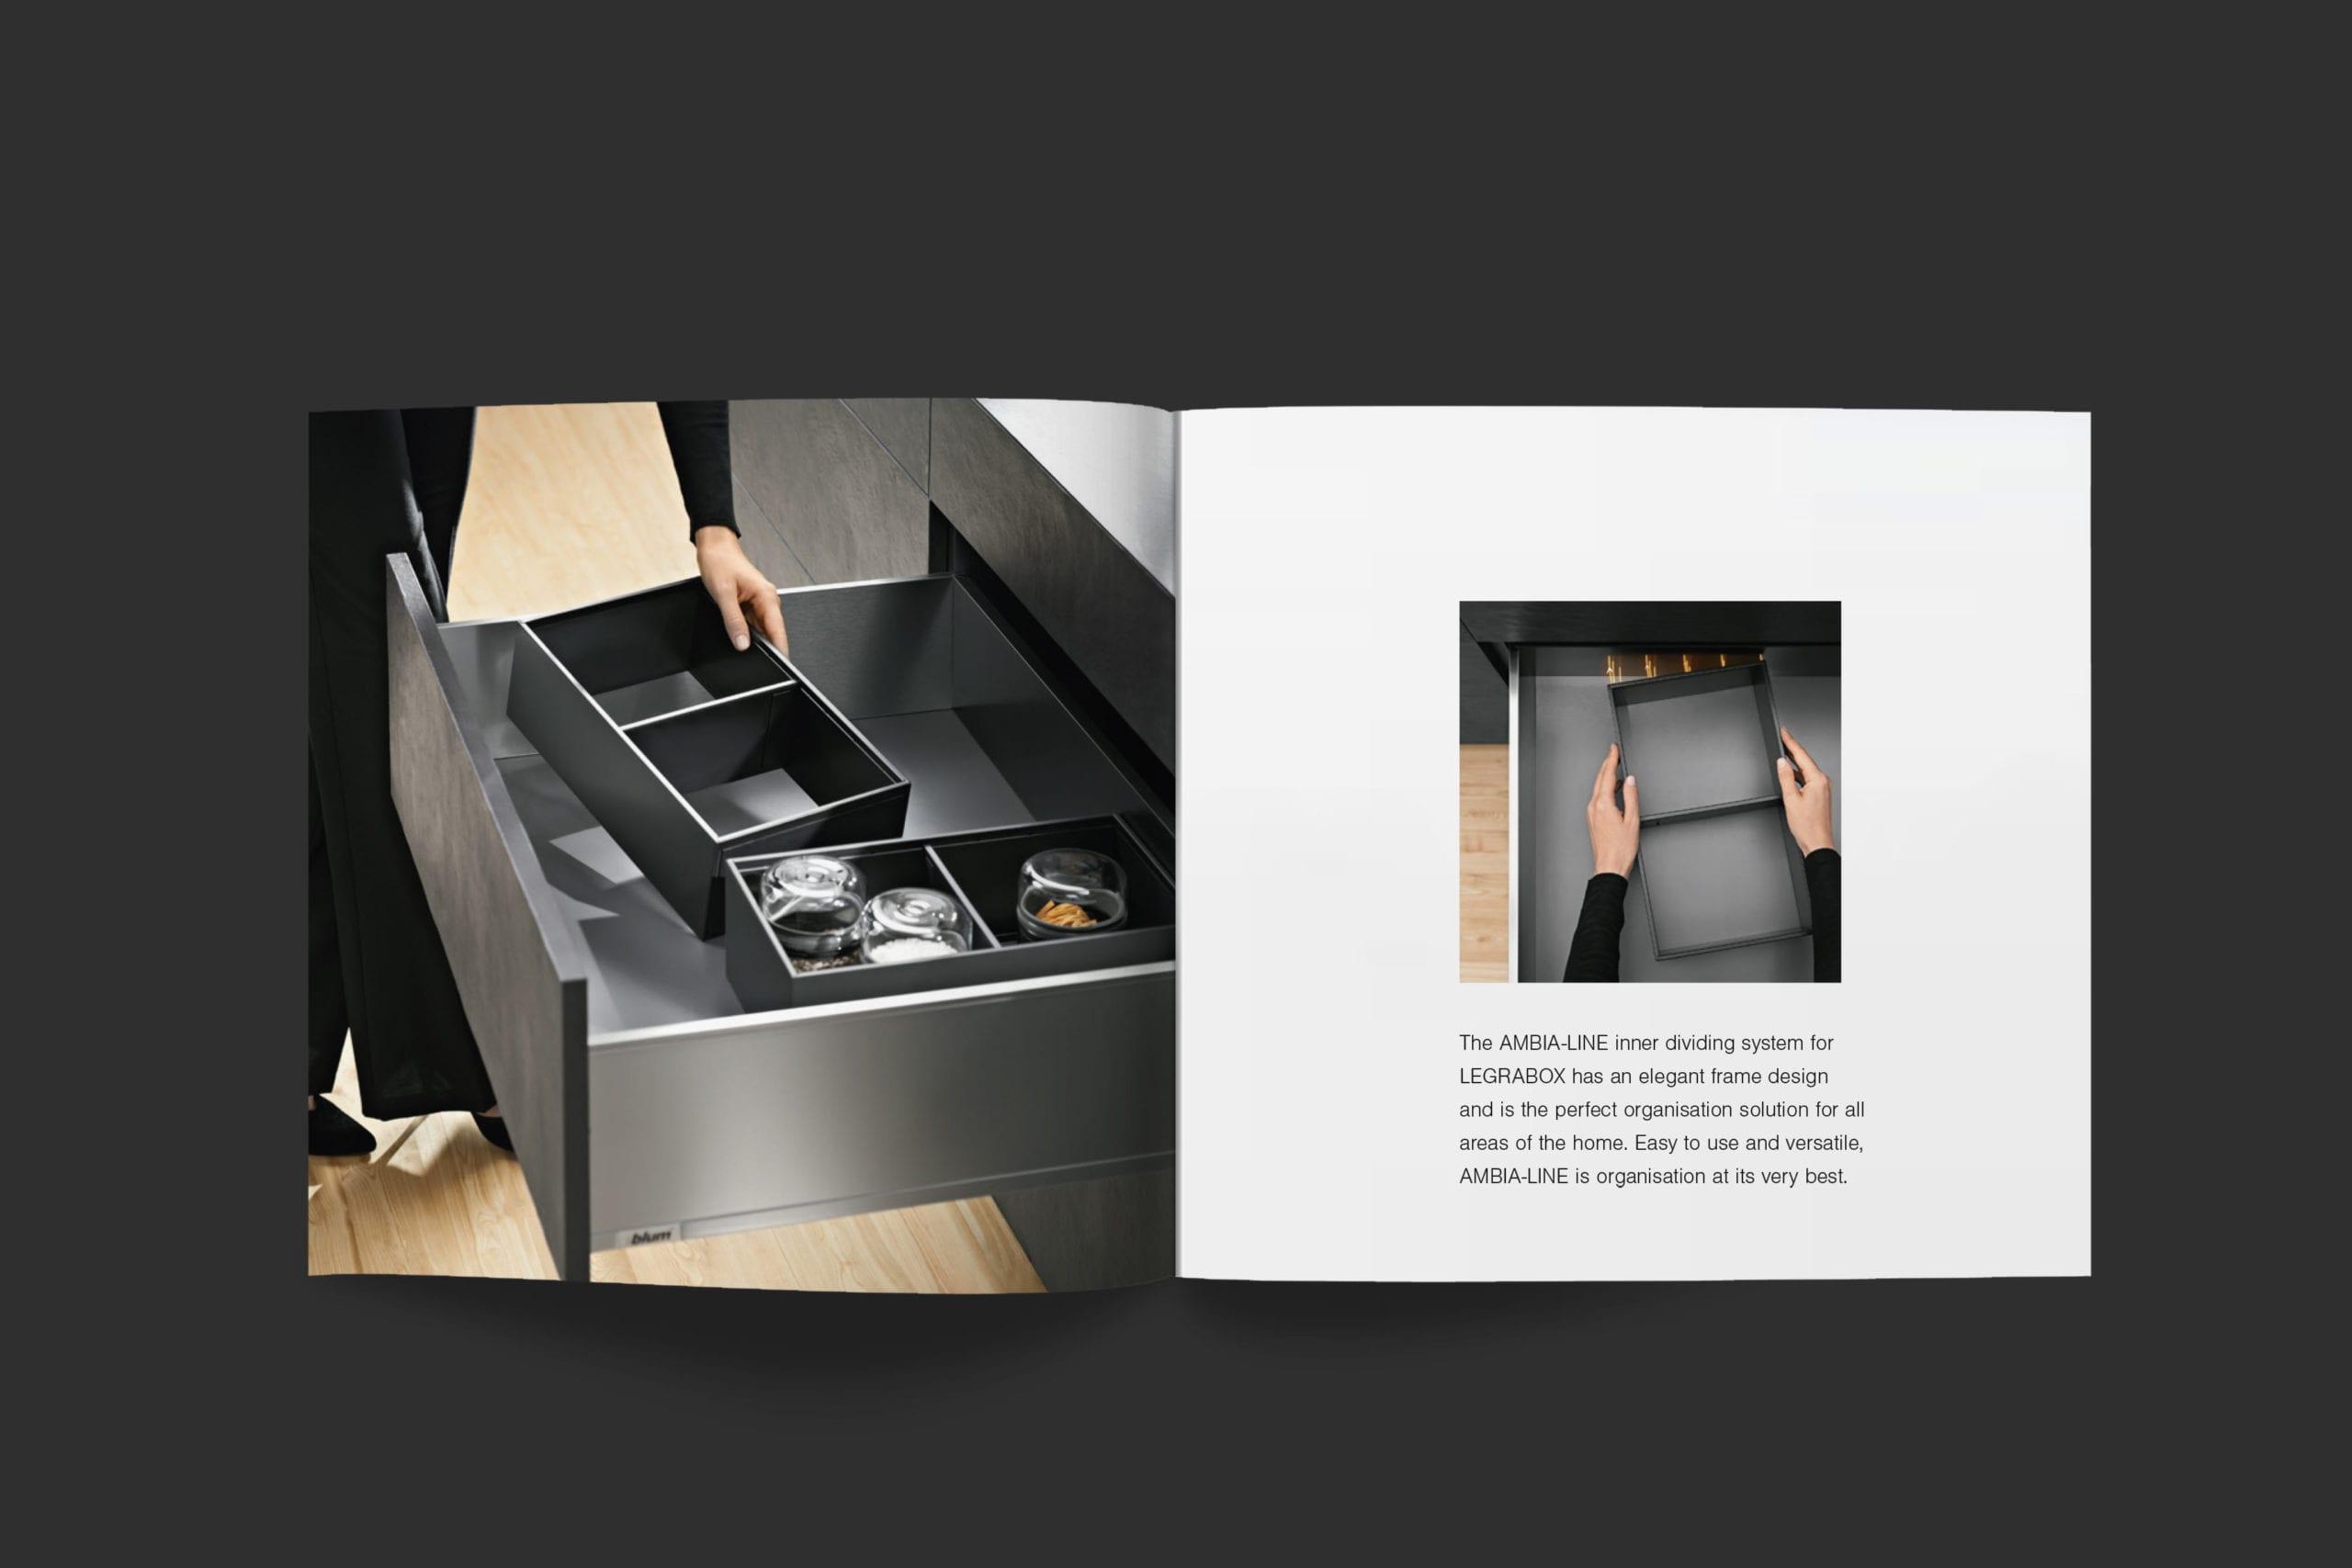 Blum | Legrabox booklet spread | Zeke Creative